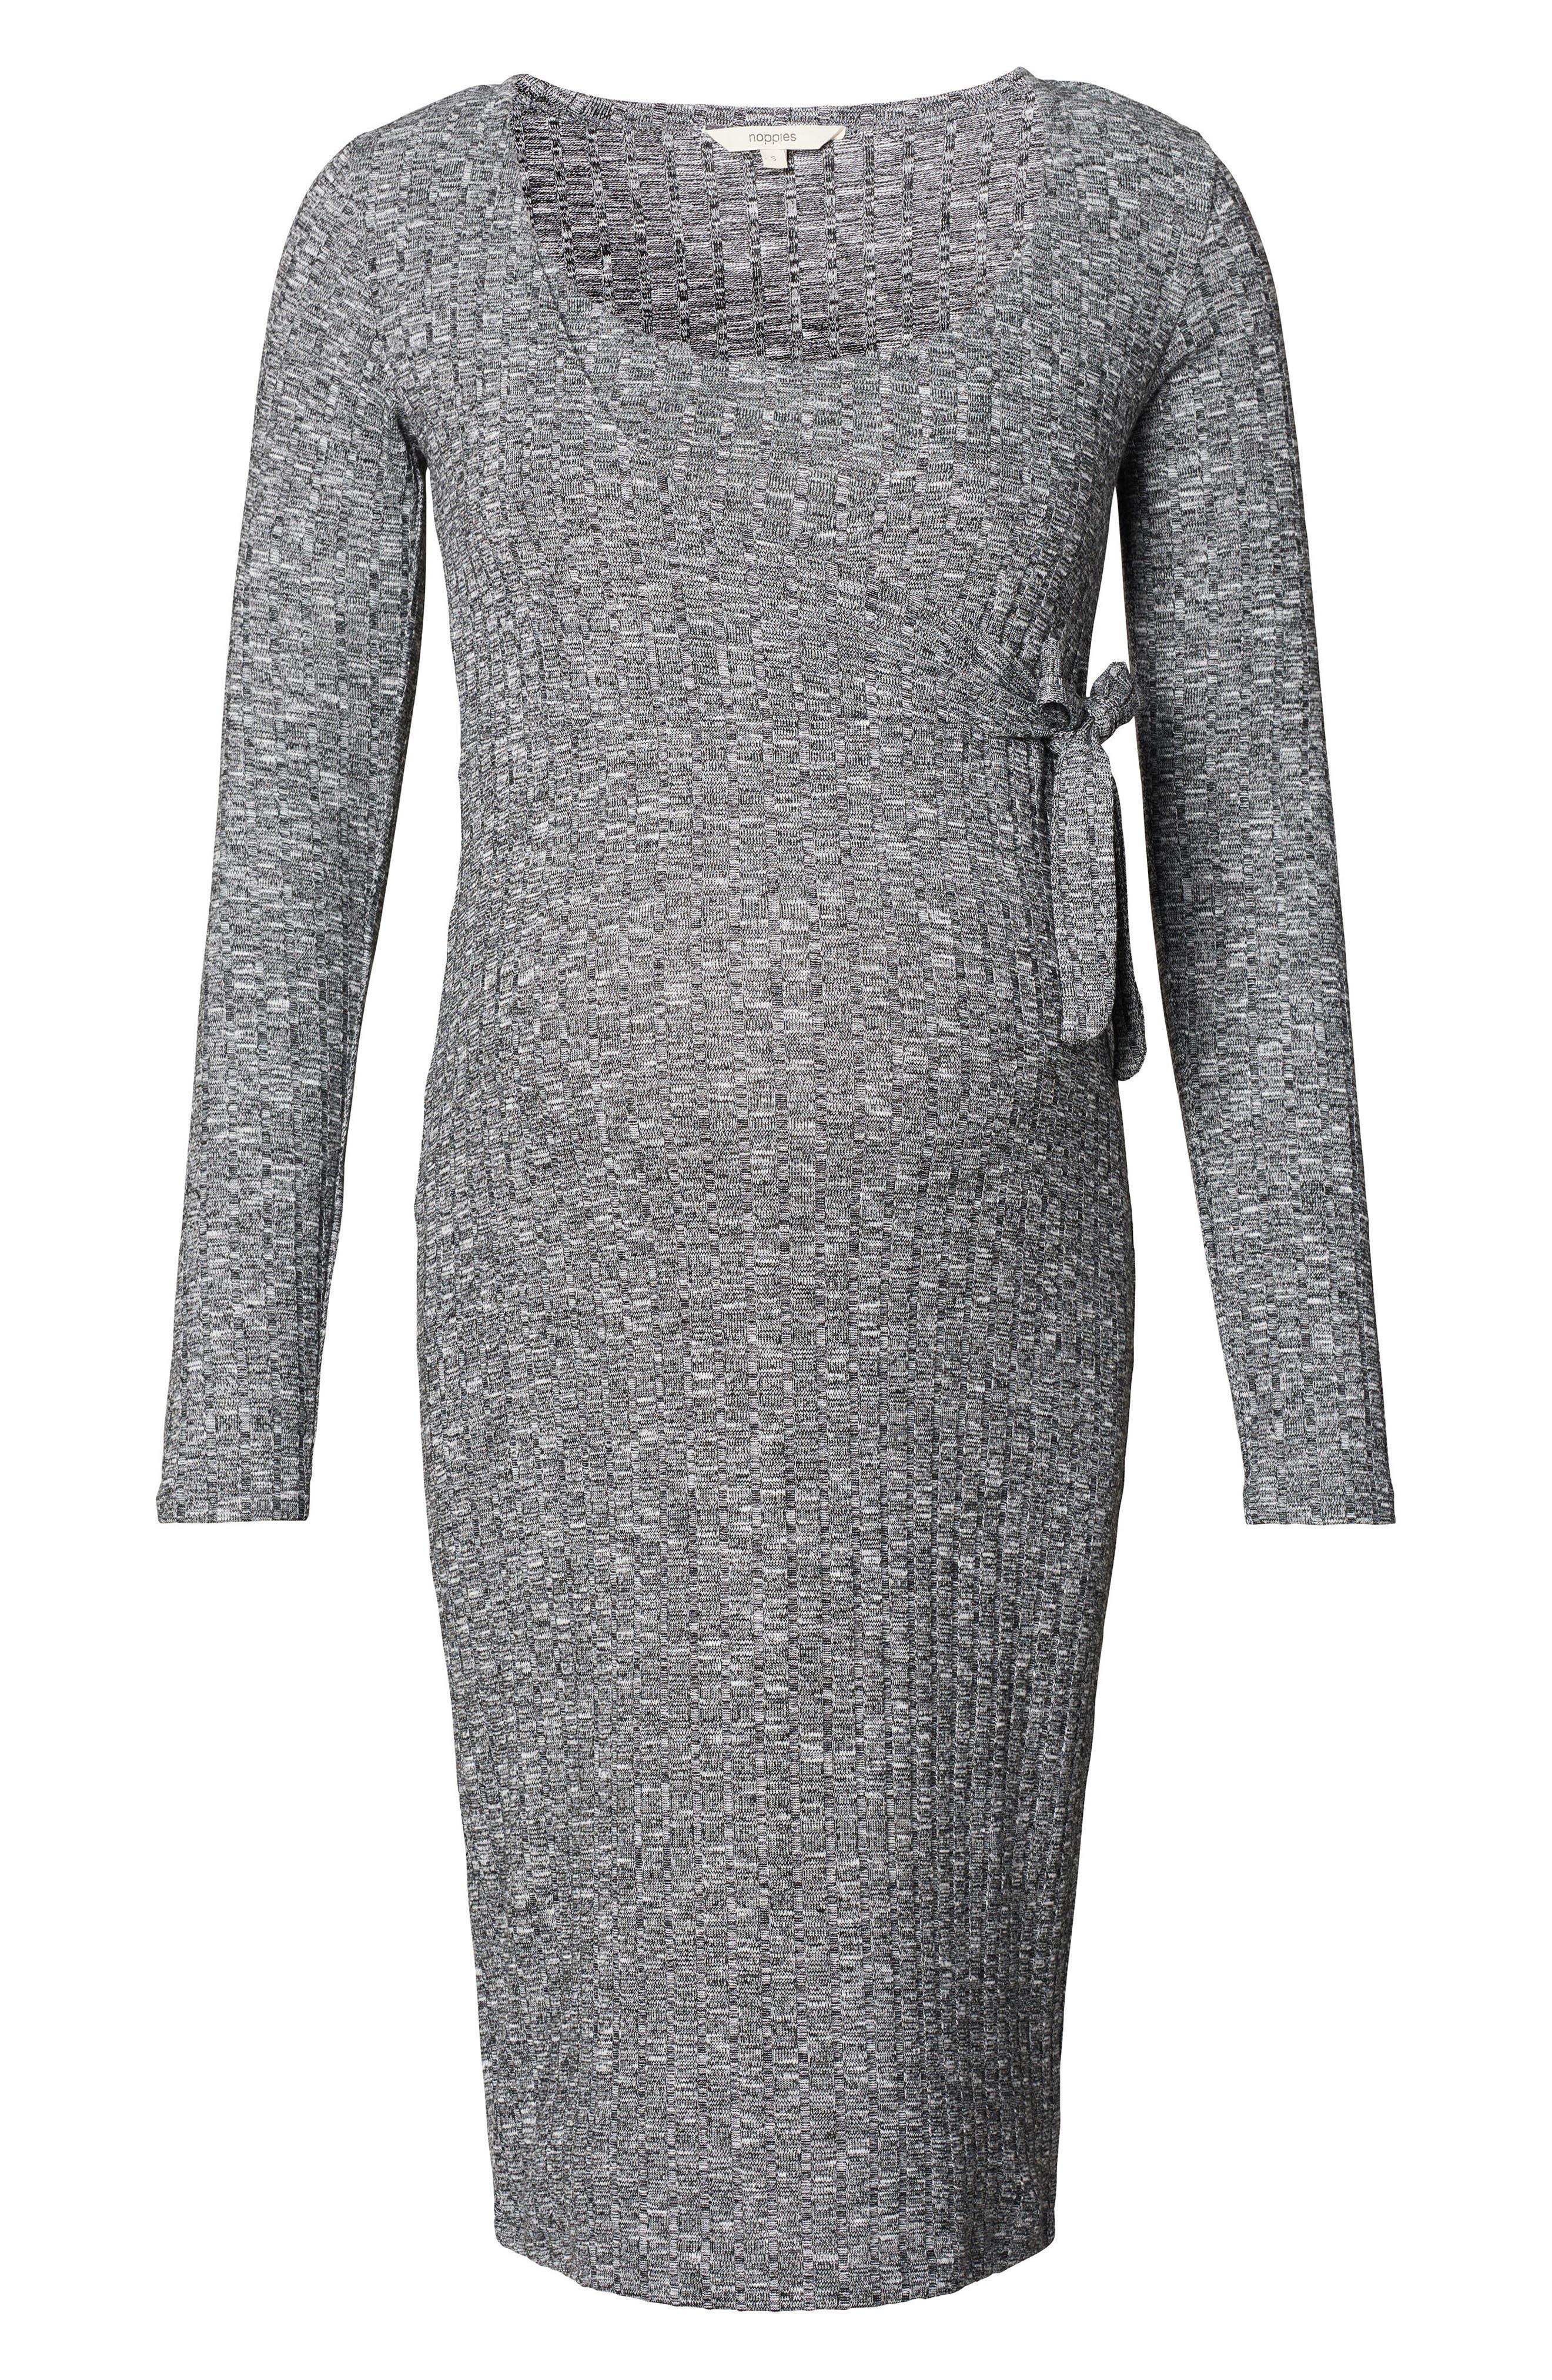 Main Image - Noppies Giulia Maternity Sweater Dress